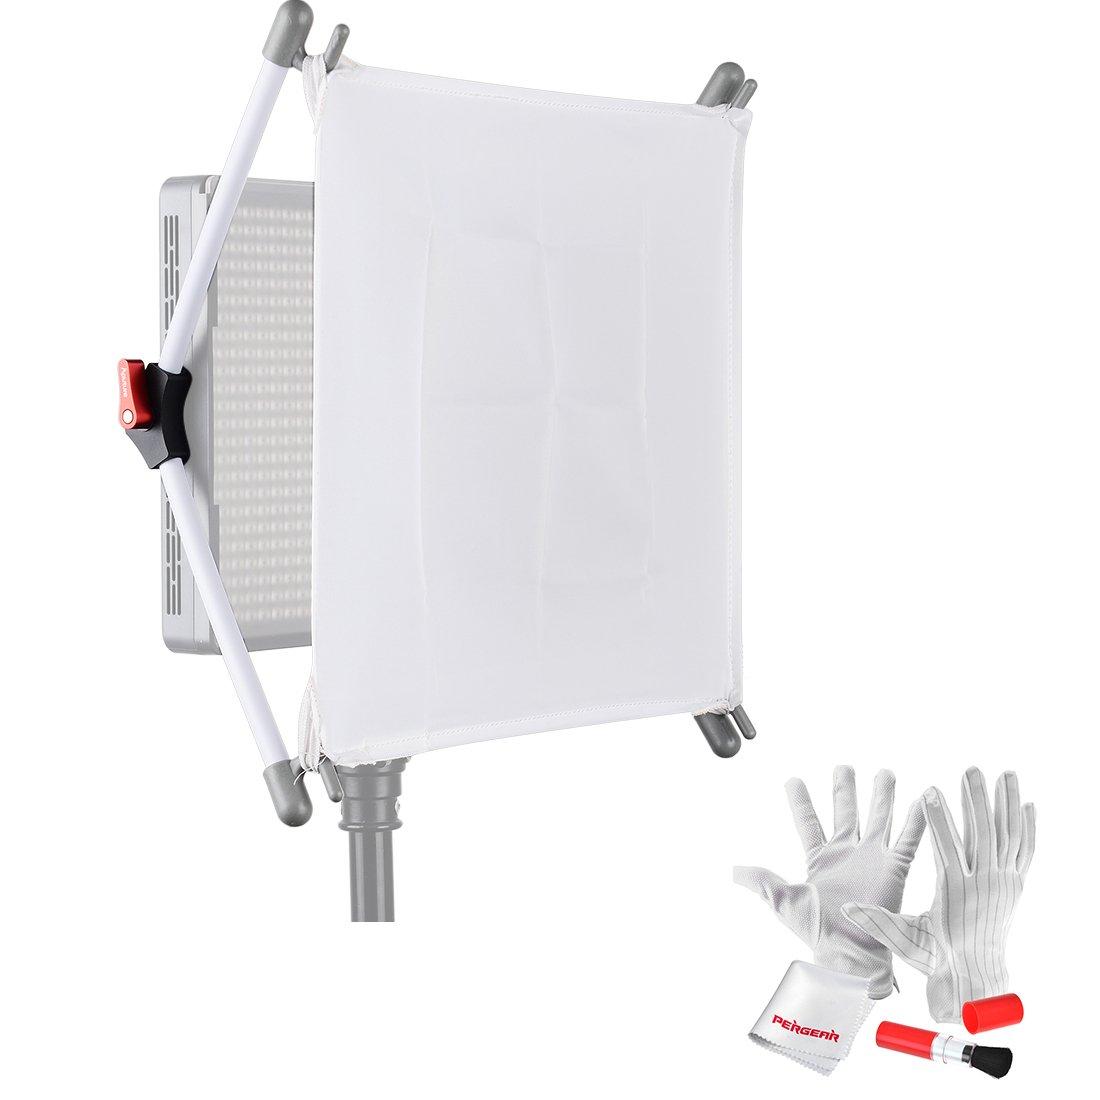 Studio Lighting Diffuser: Studio Light Easy Frost Diffuser Kit Lighting Reflector